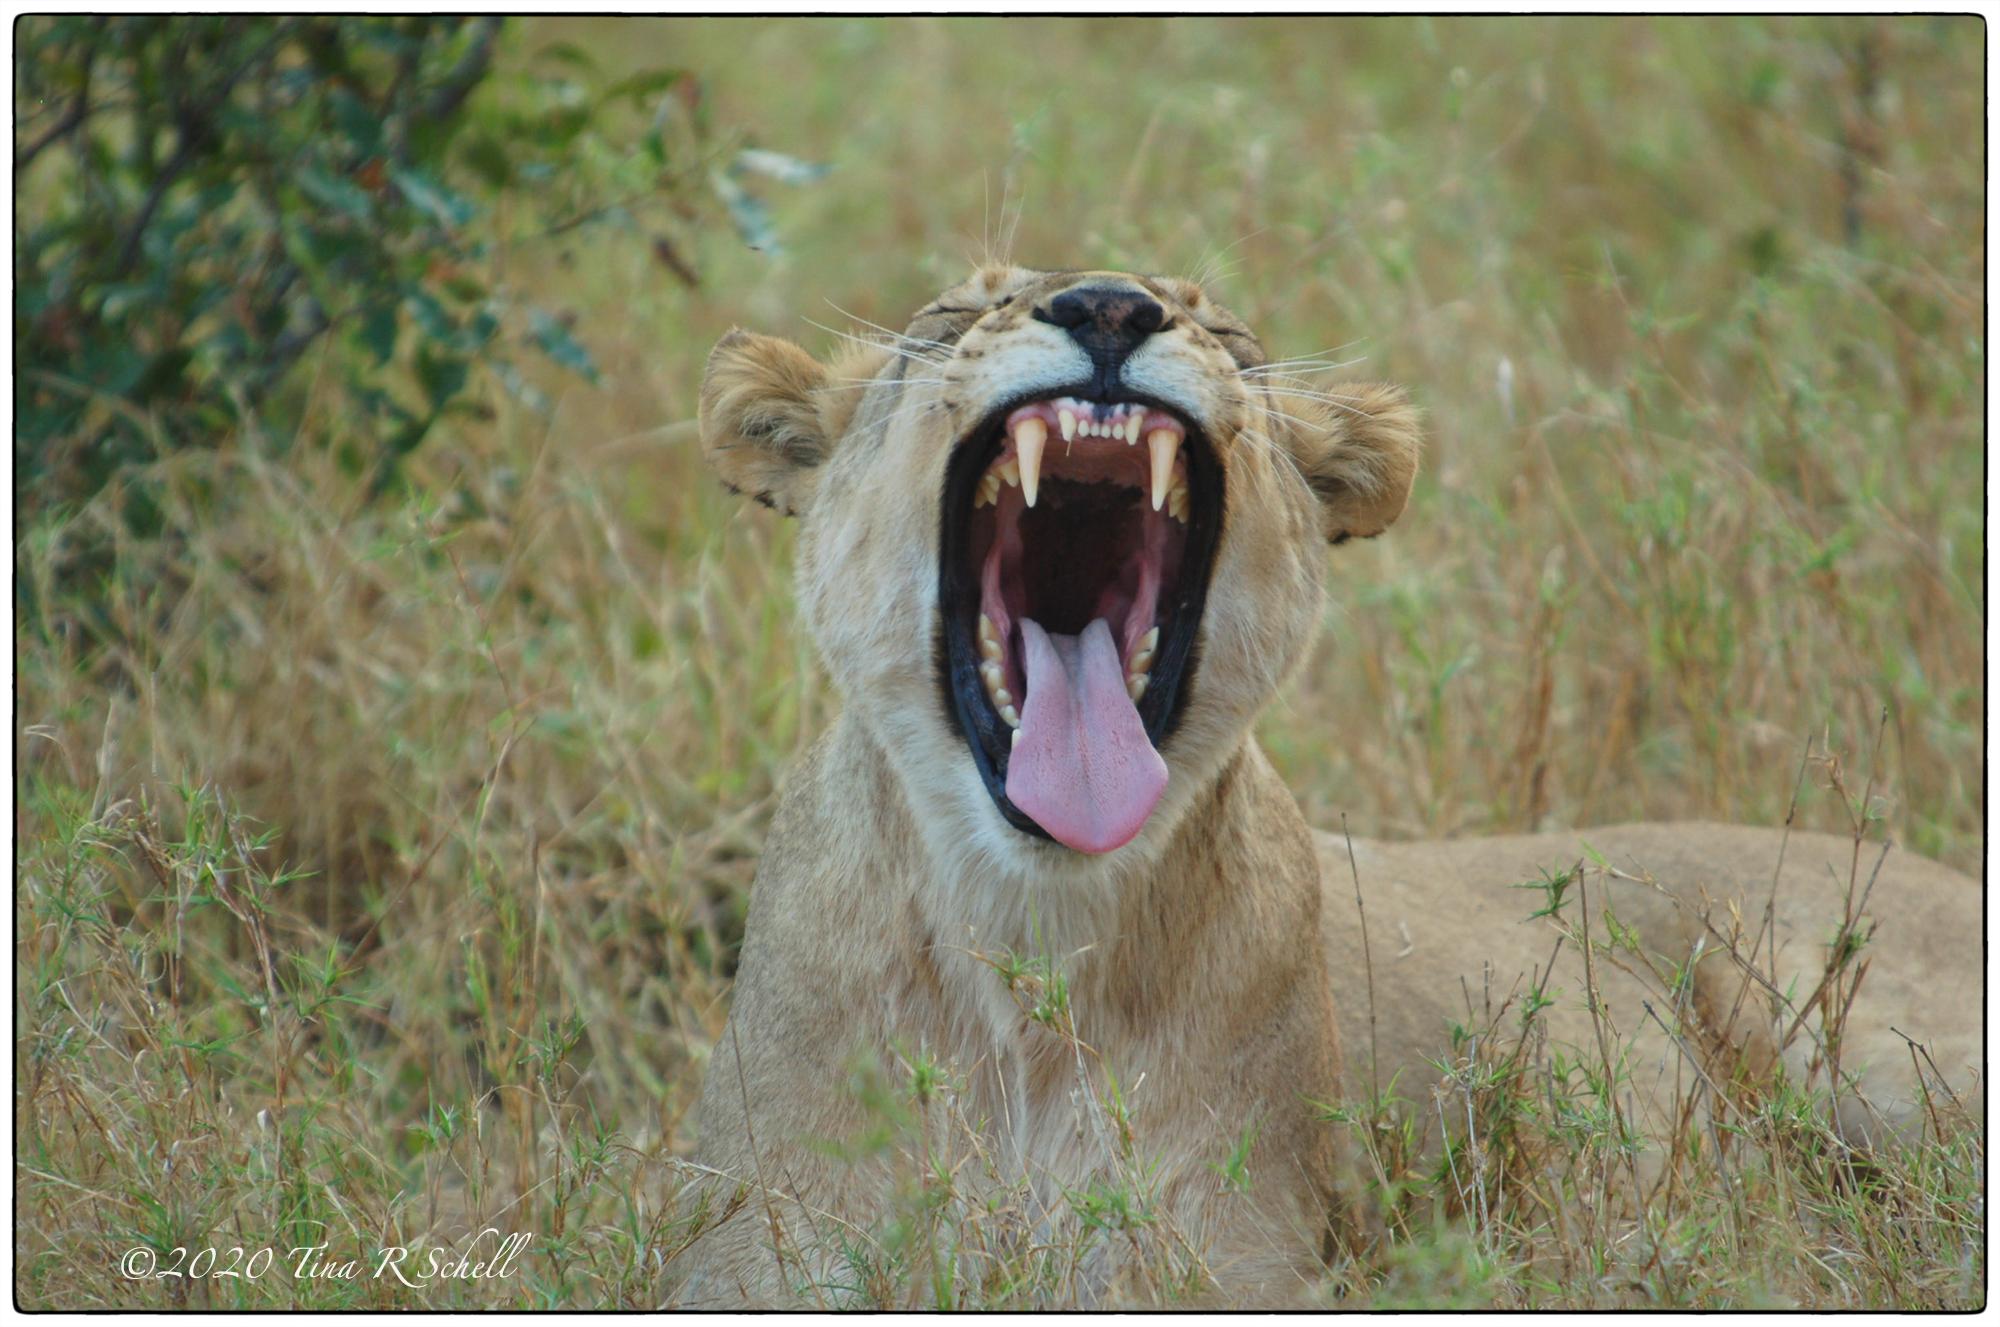 lion, yawning, teeth, tongue